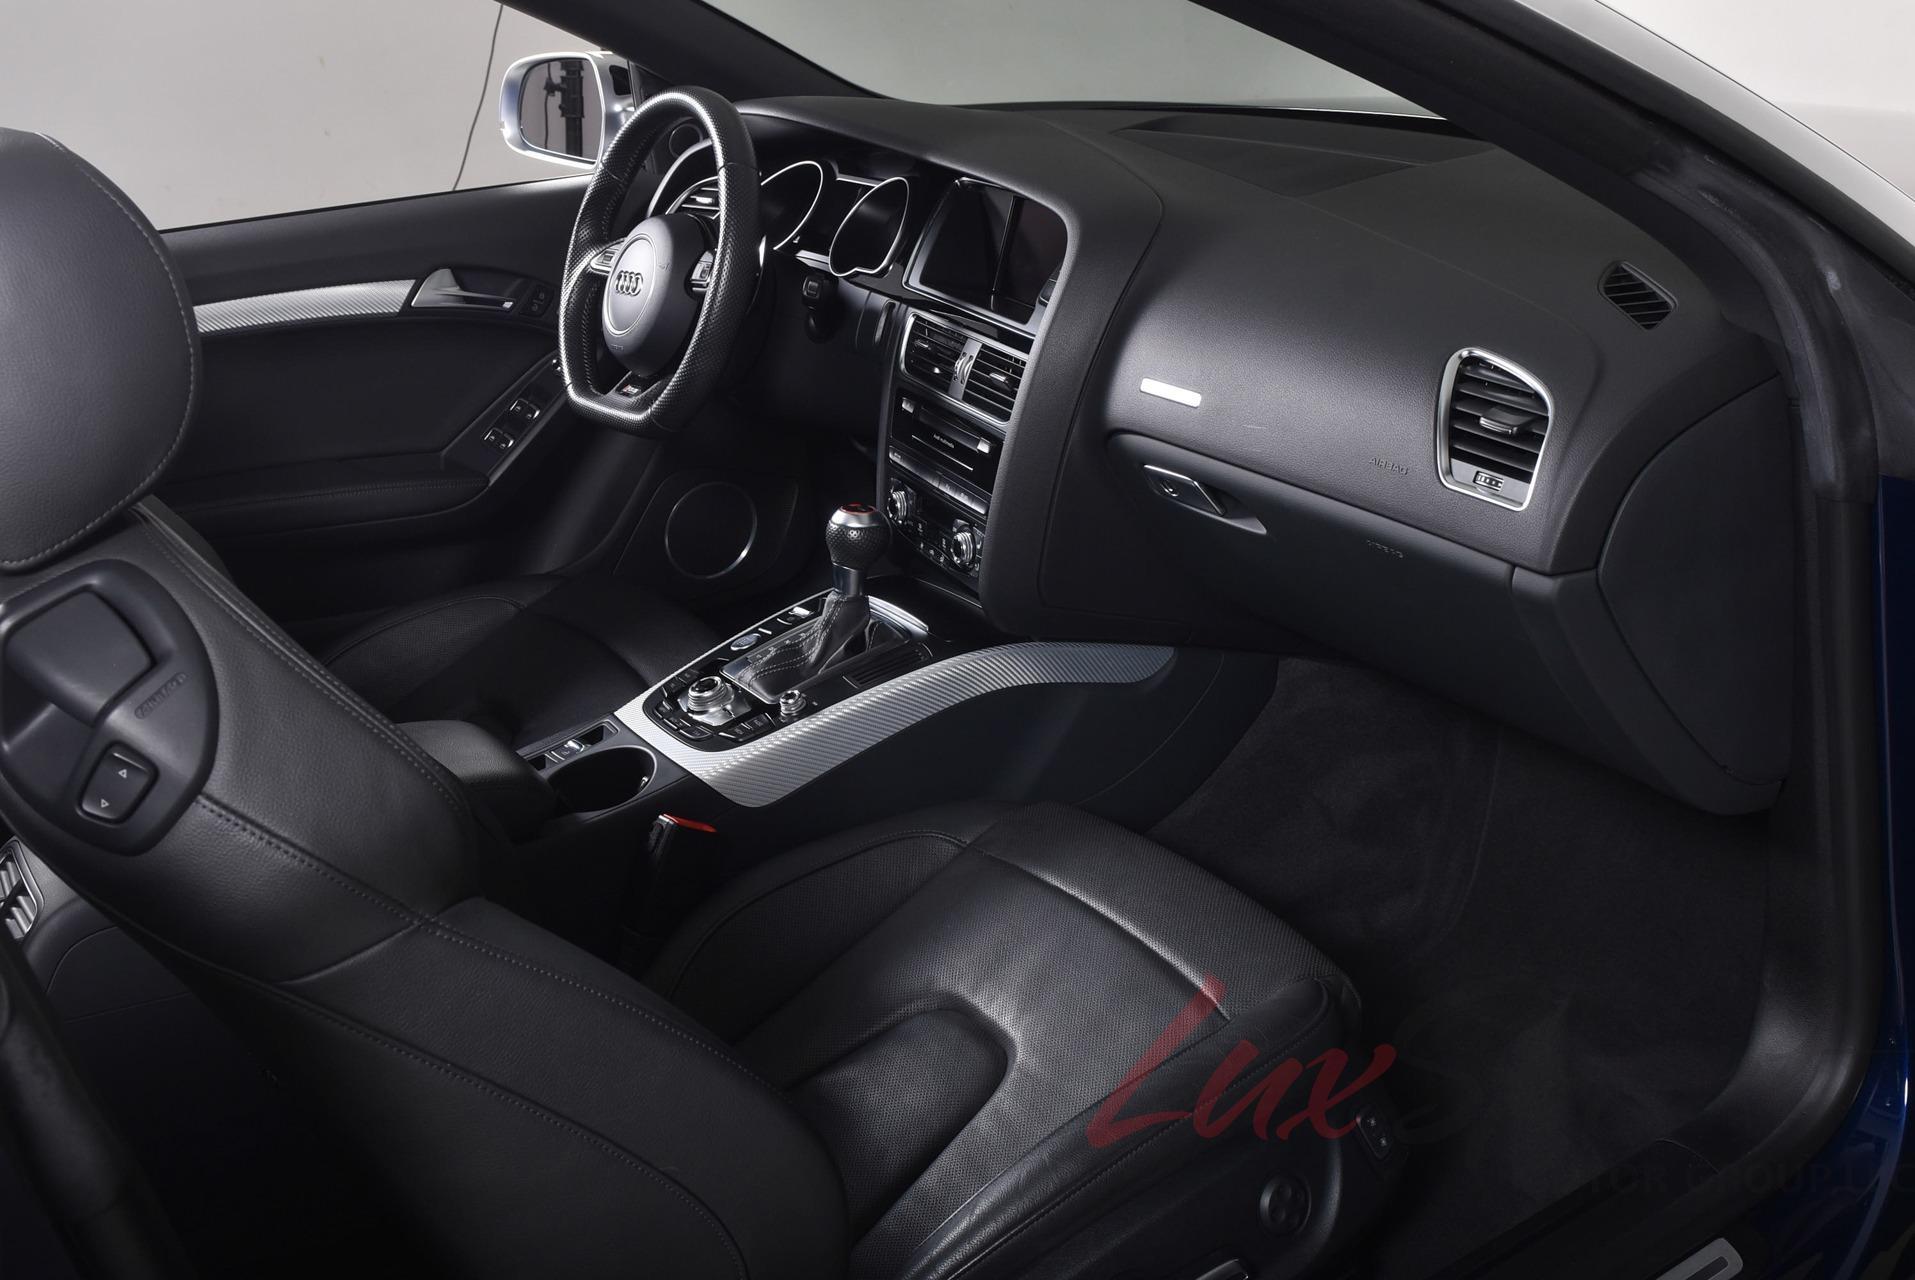 Used 2014 Audi RS 5 quattro S tronic | Syosset, NY